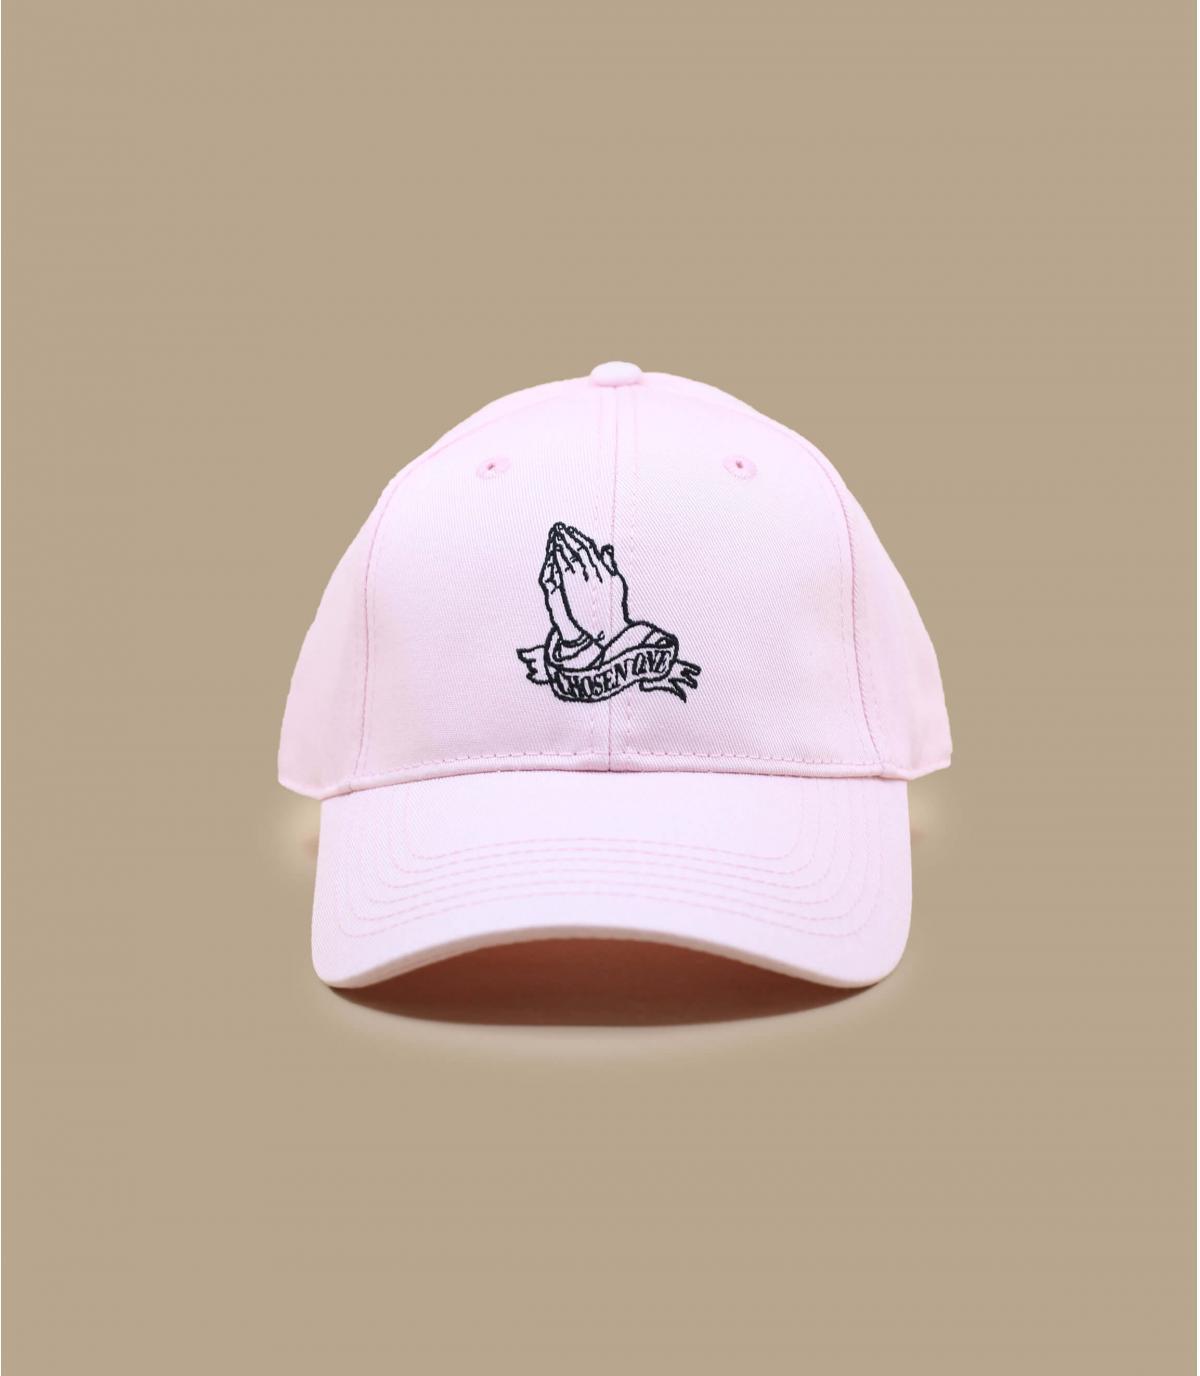 Details Chosen One Curved Cap pale pink - Abbildung 2